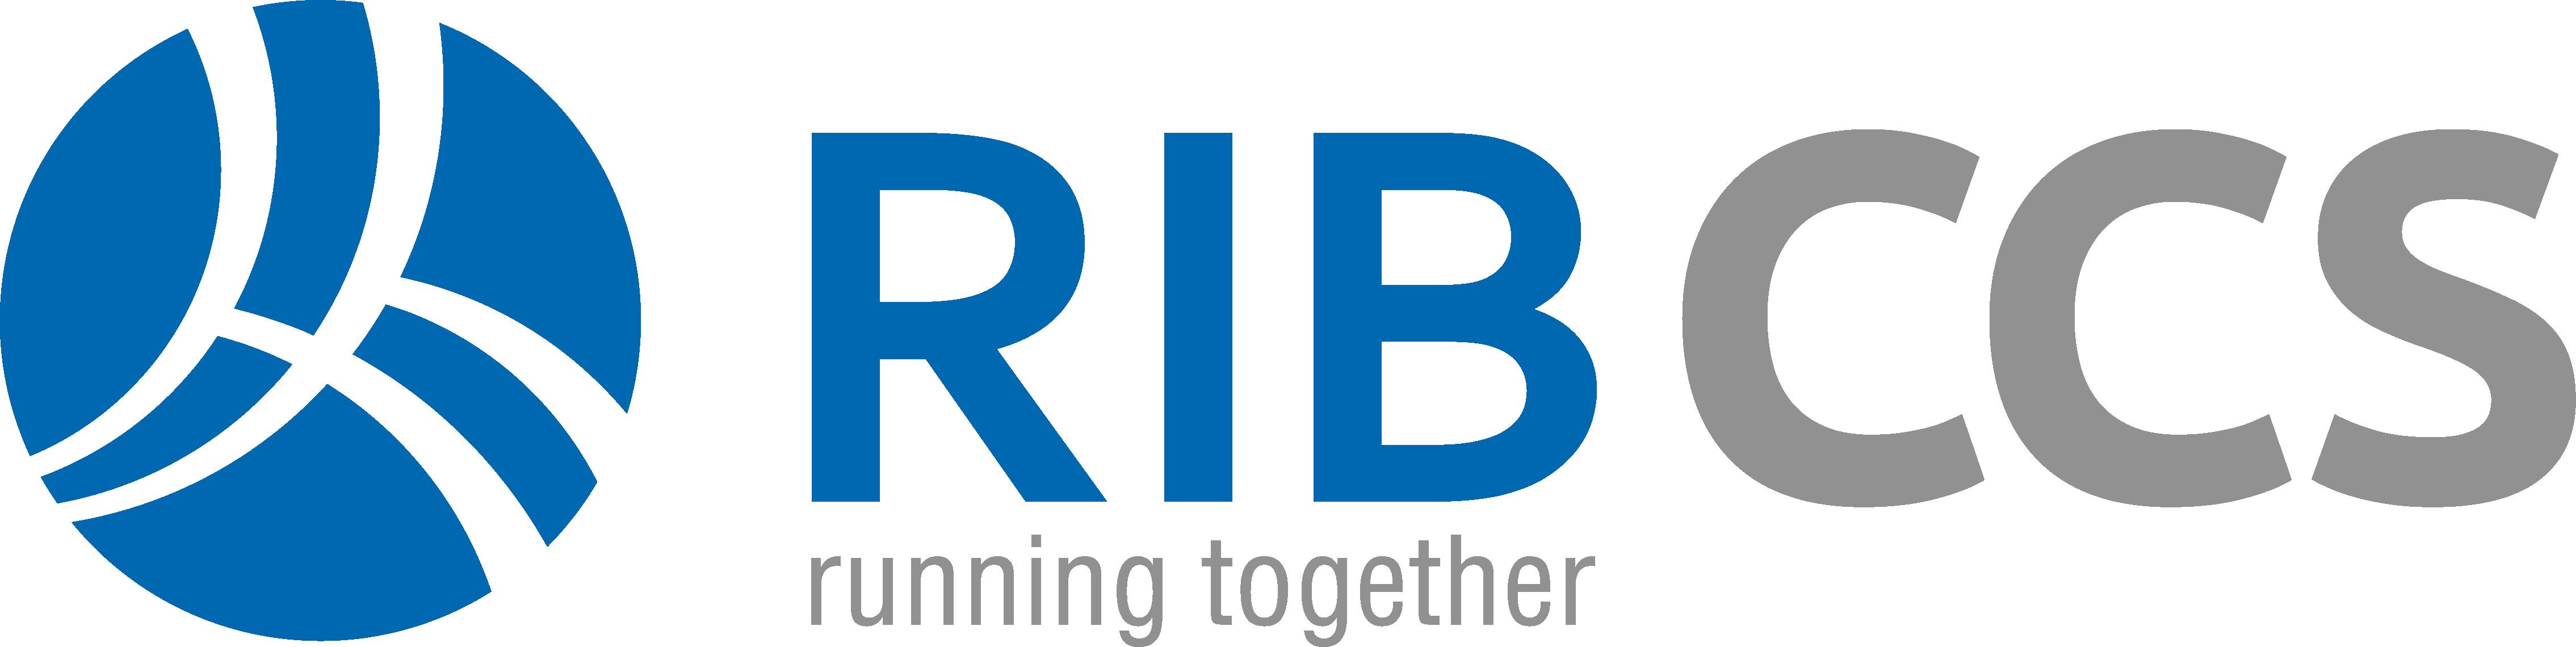 RIB CCS logo